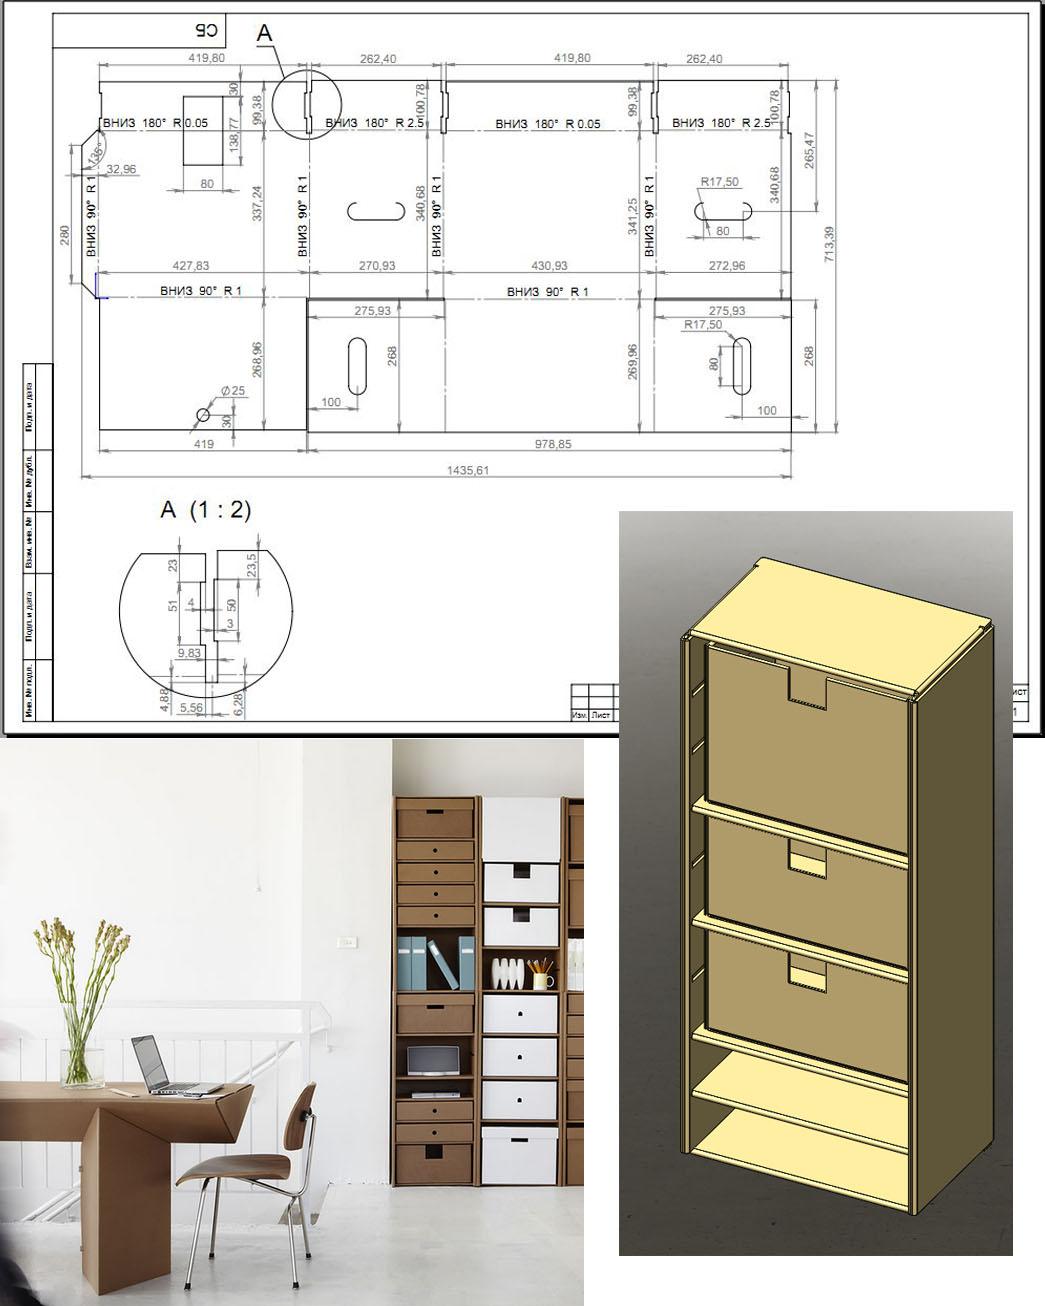 Мебель из картонных коробок схемы